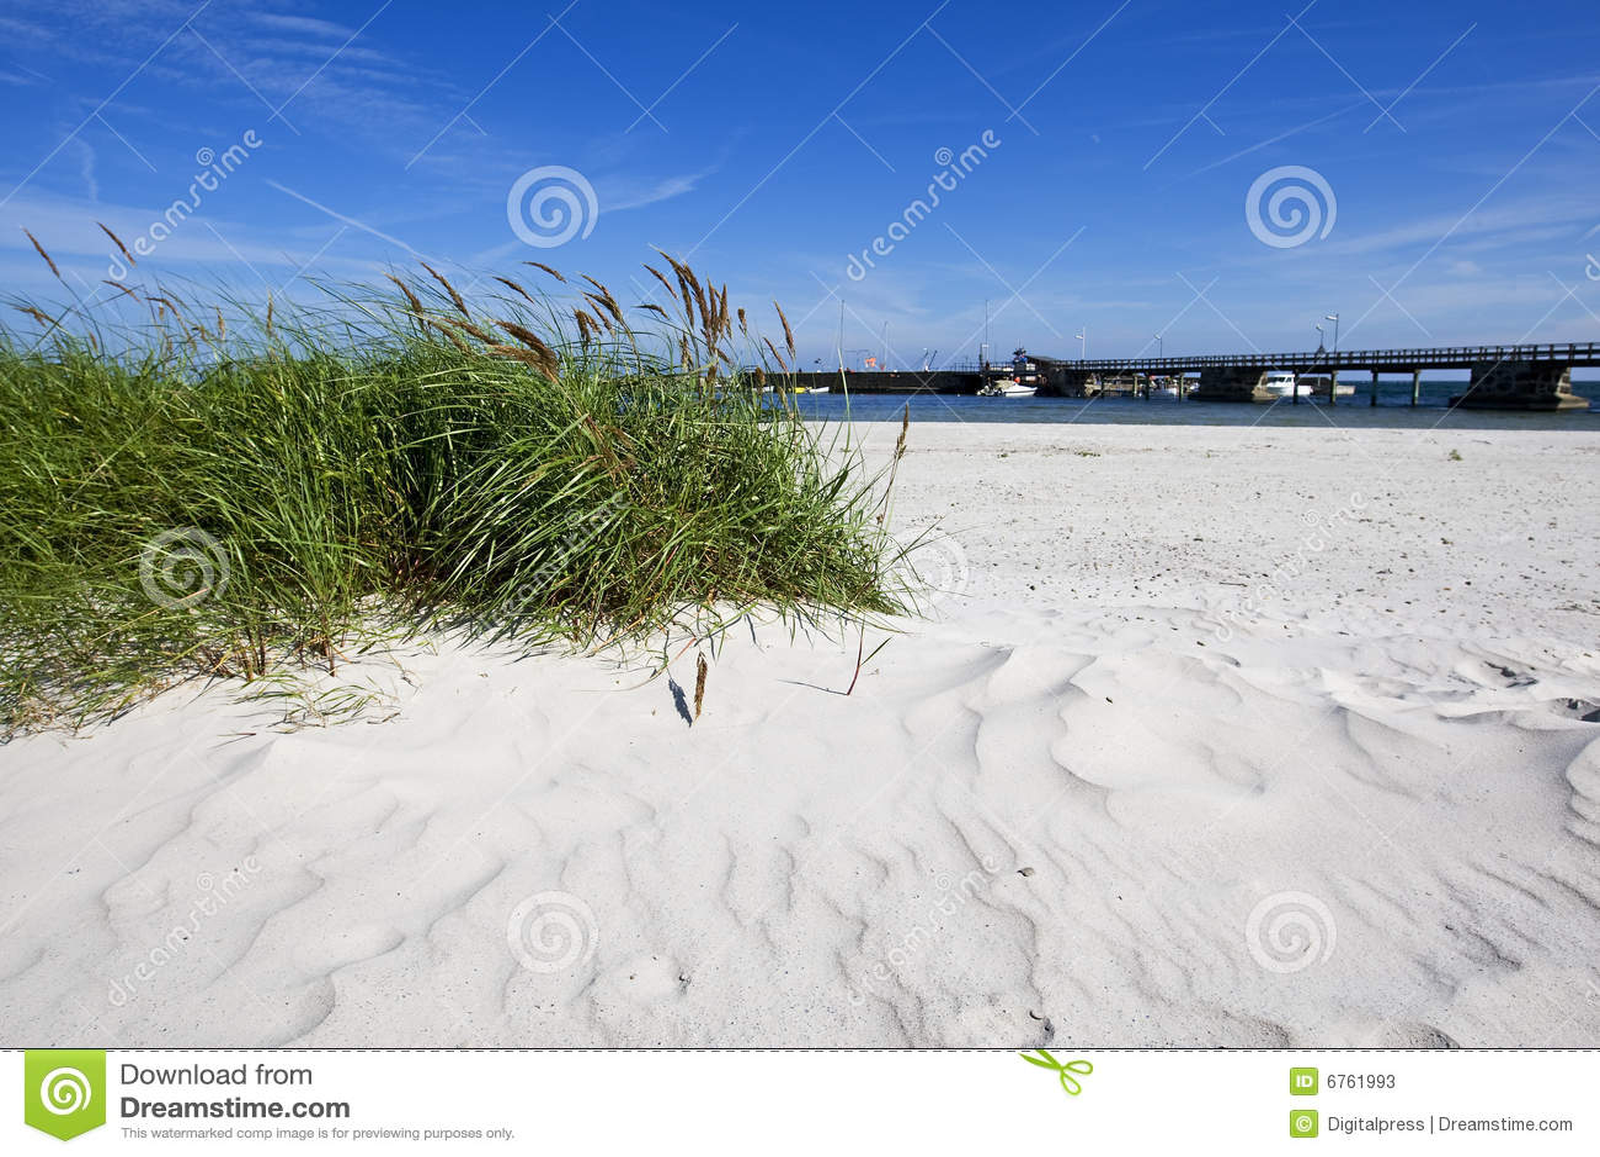 Snogebaek, beach Bornholm, Denmark